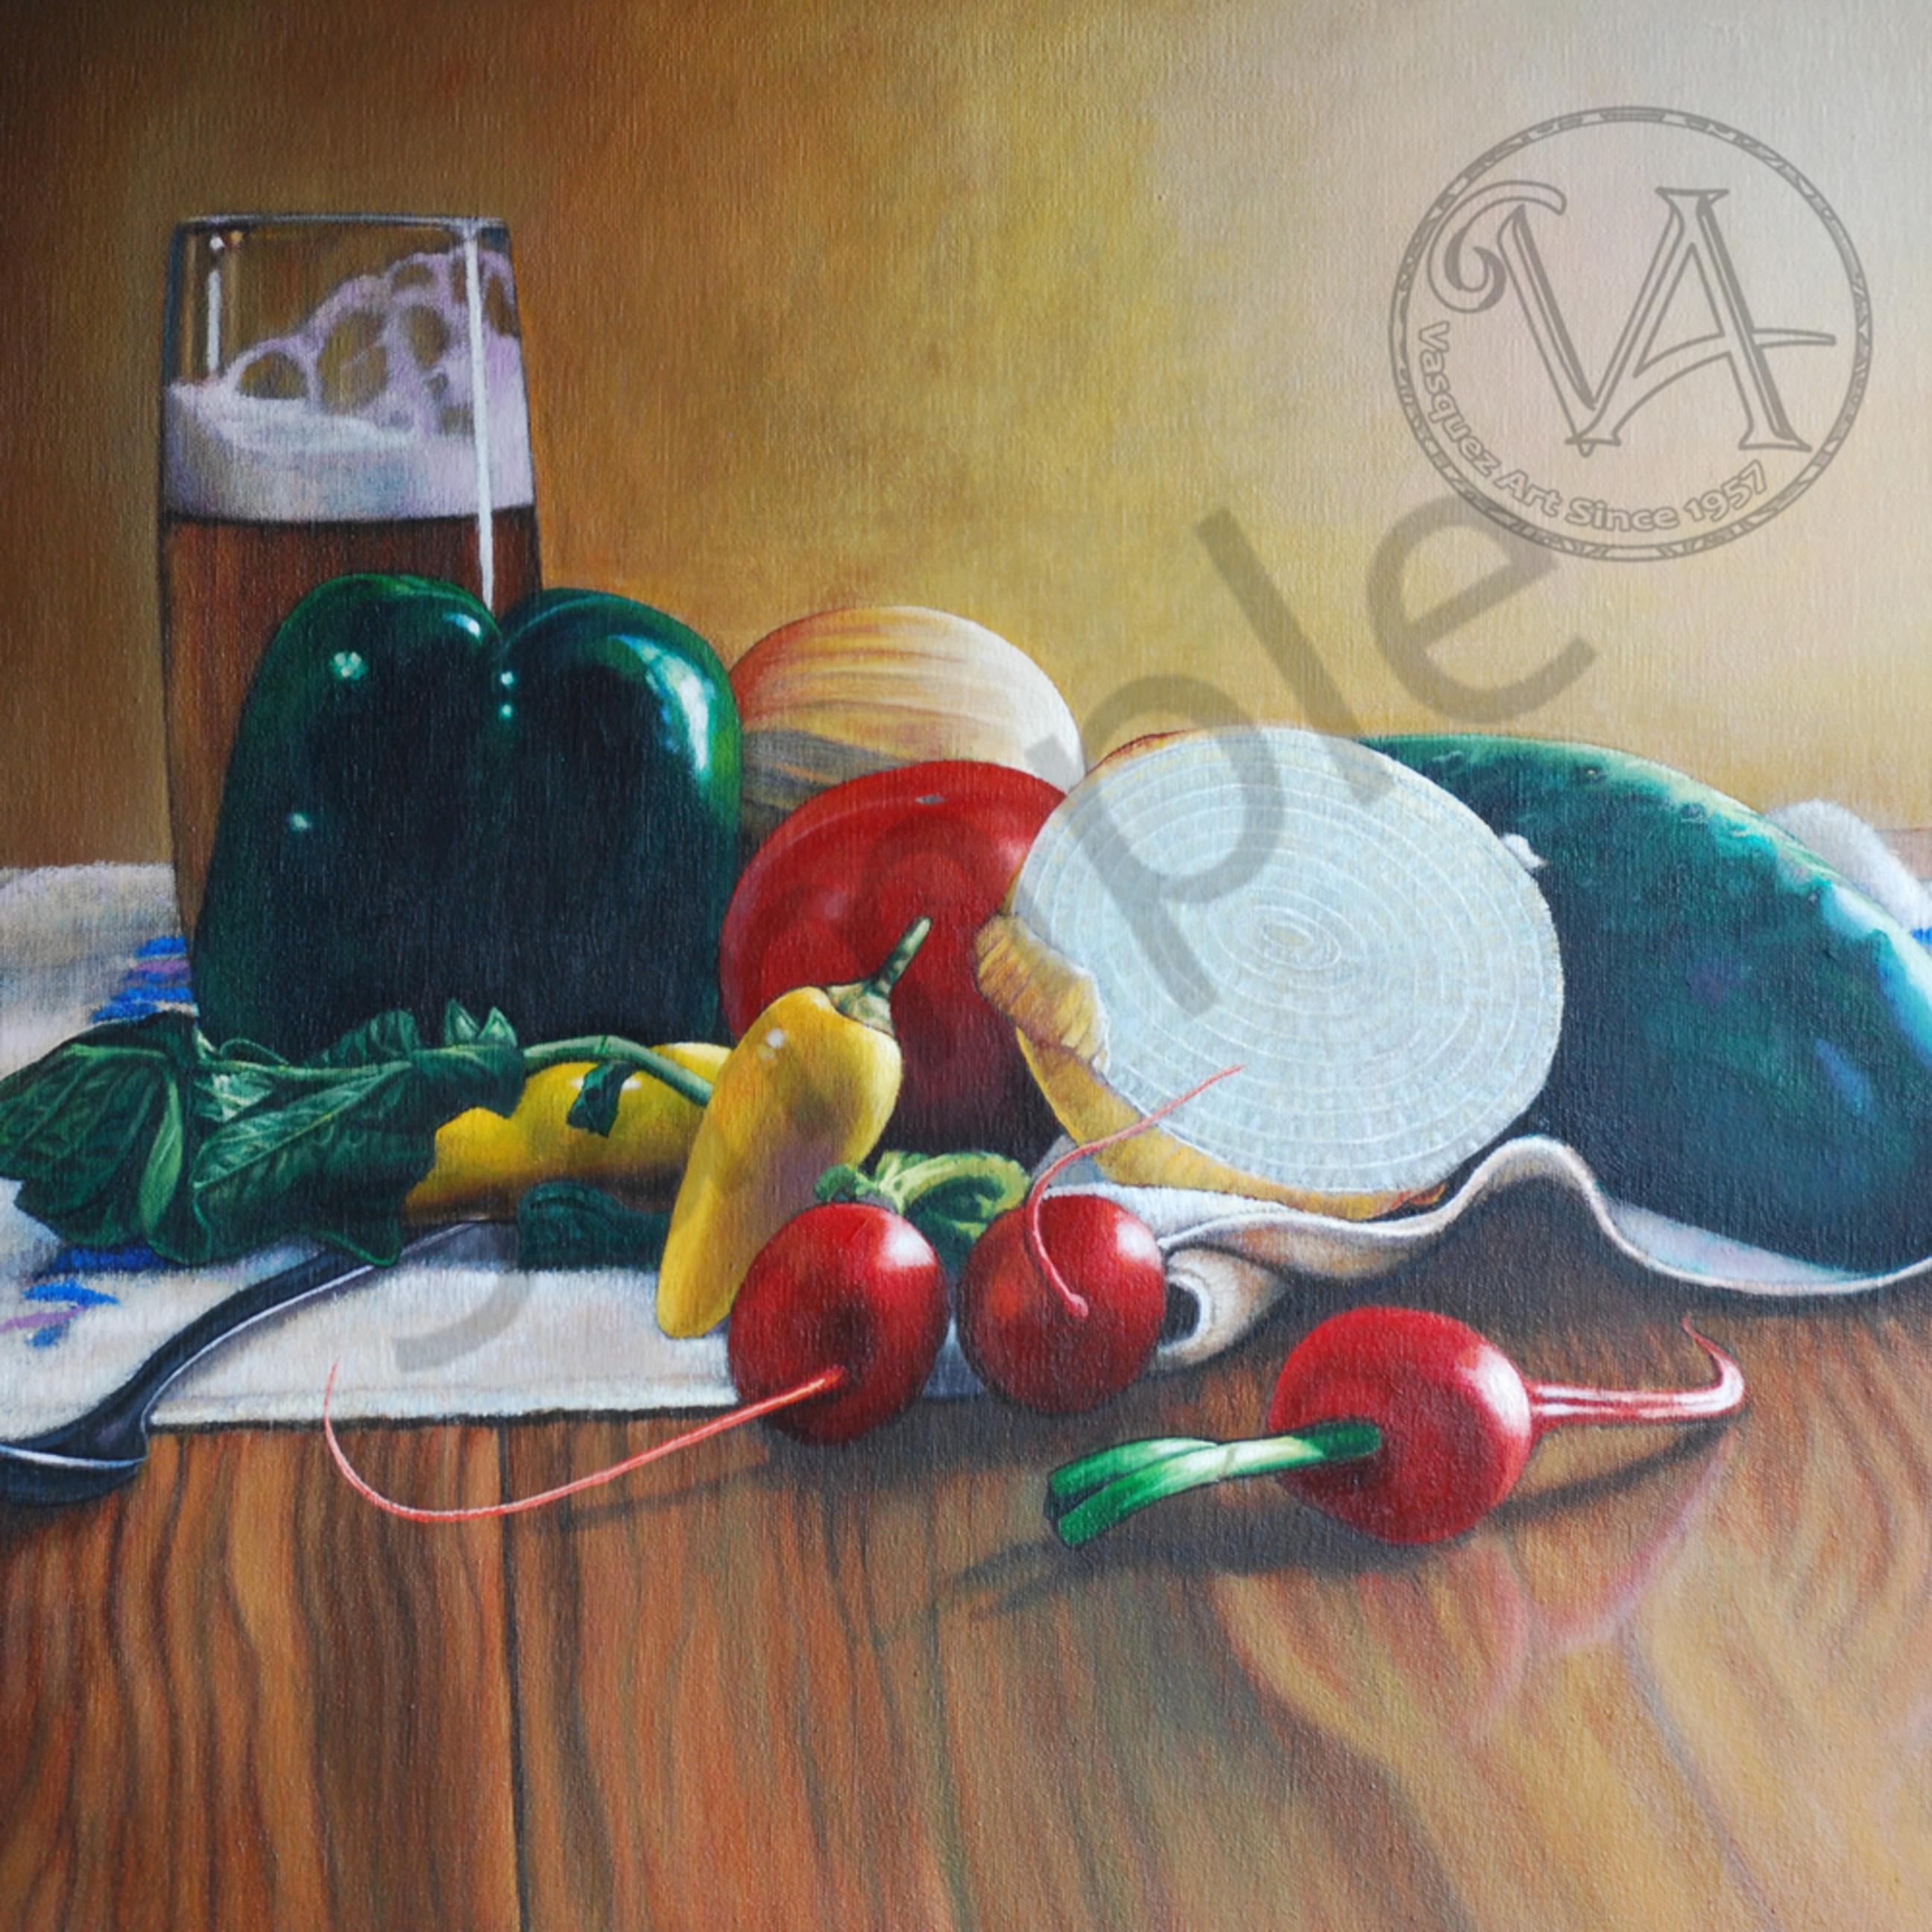 Beer and vegetables still life fi wuvcv2